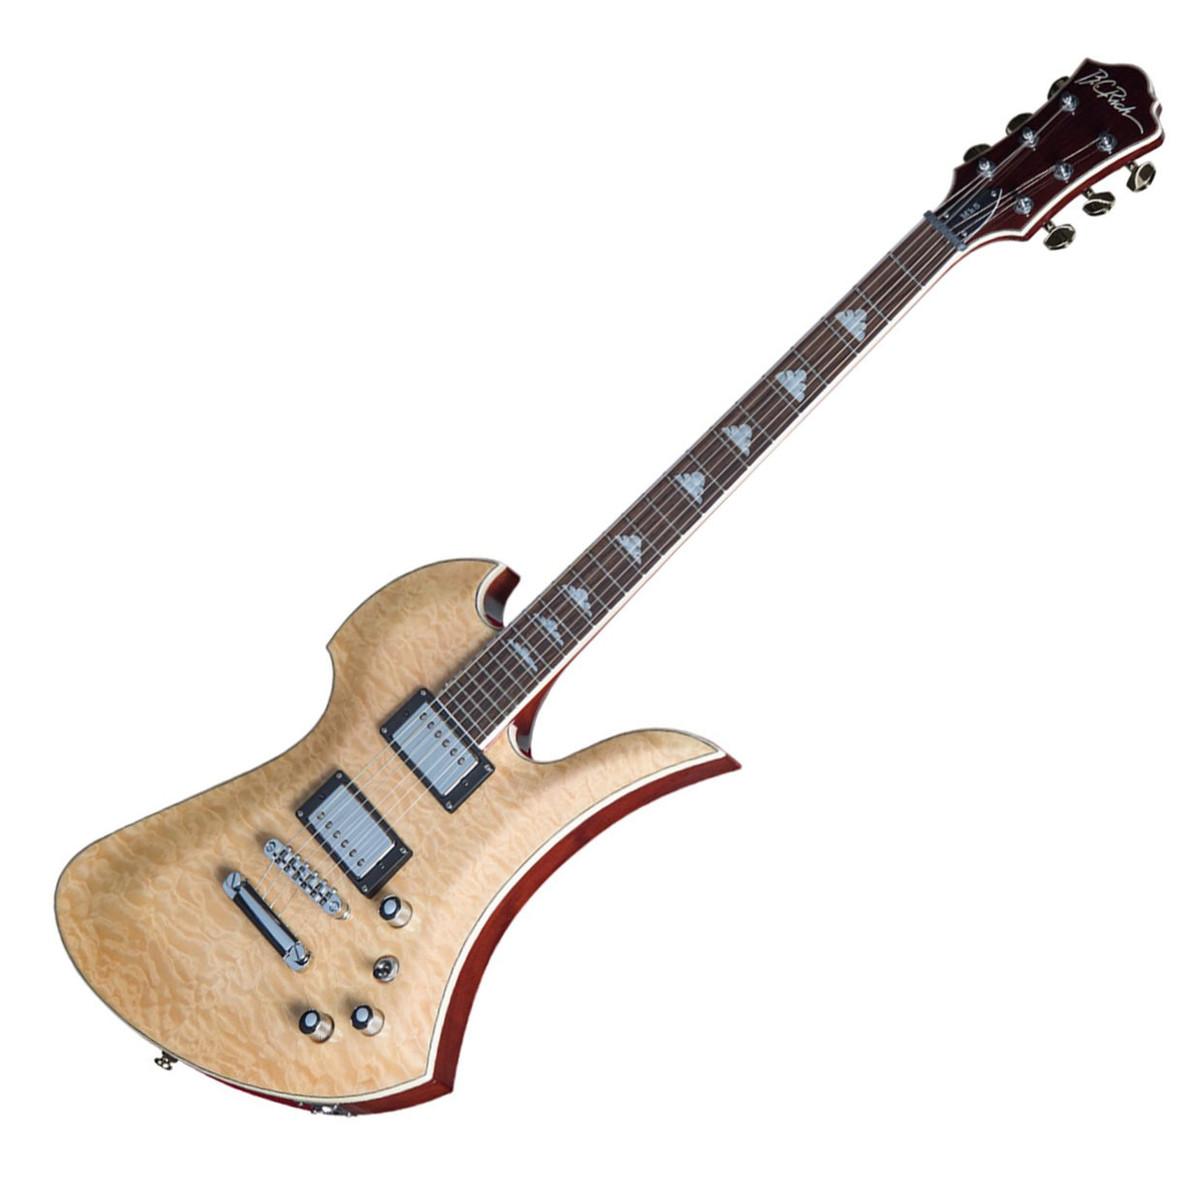 bc rich mockingbird mk5 electric guitar with trem natural at. Black Bedroom Furniture Sets. Home Design Ideas